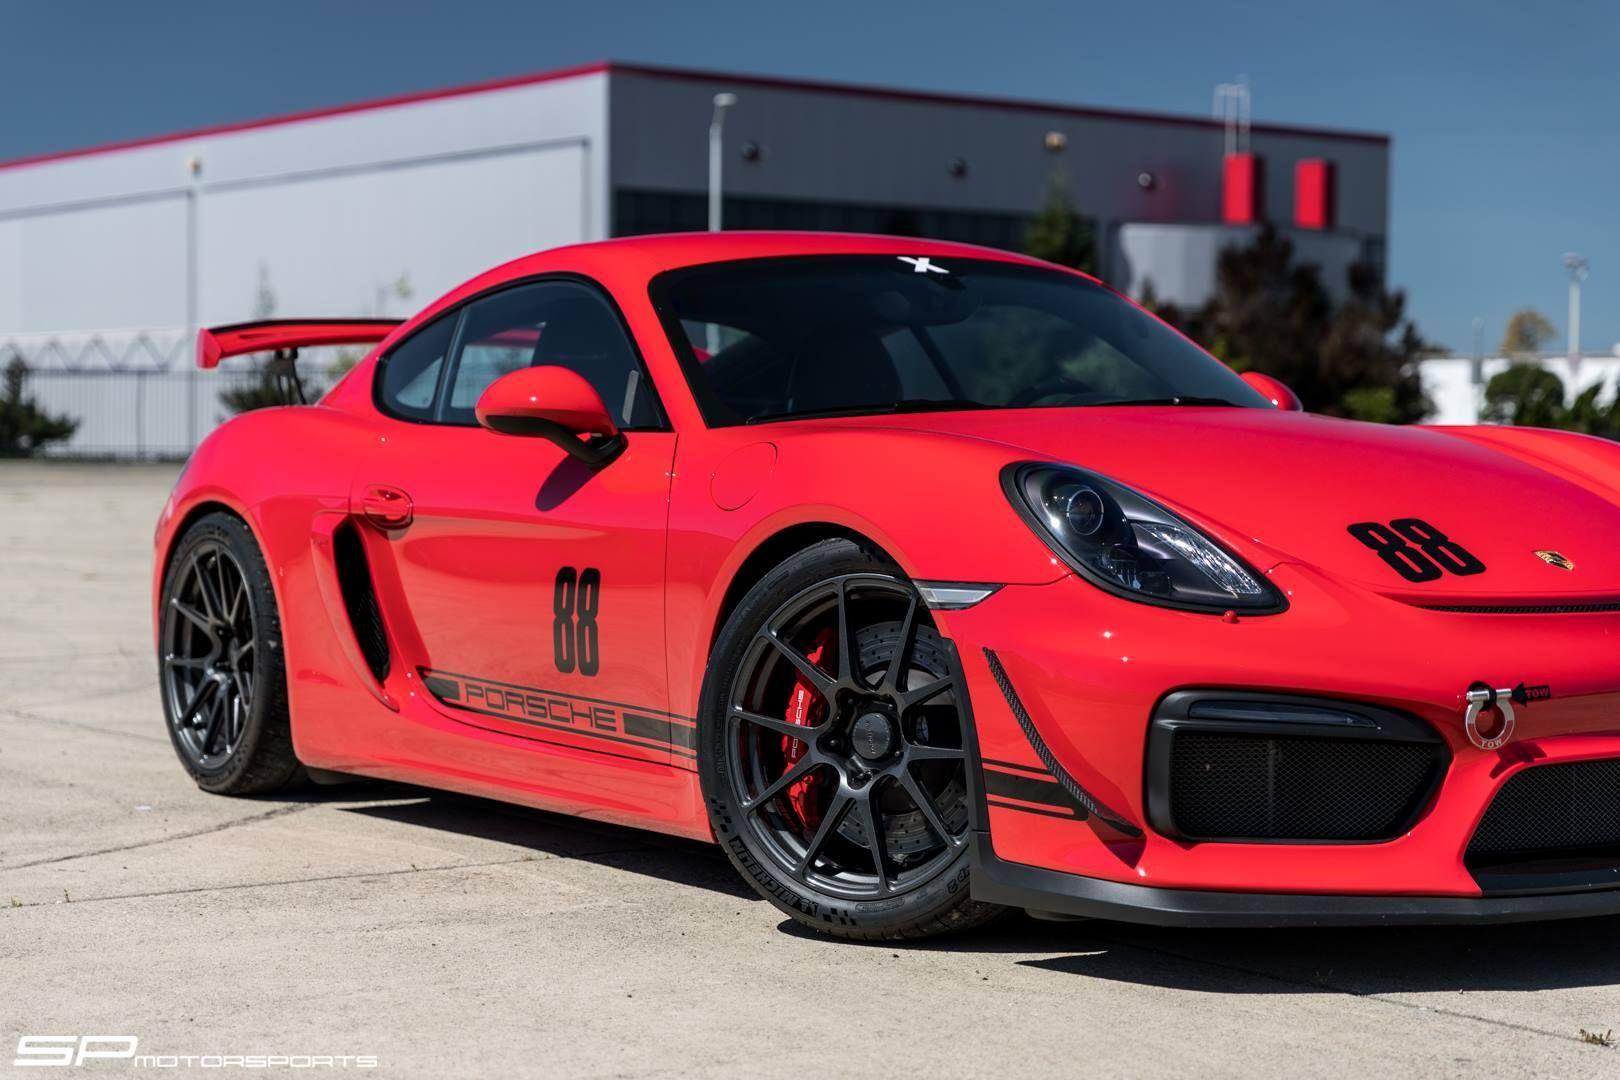 2016 Porsche Cayman   Steve's SP Motorsports Guards Red Porsche Cayman GT4 on Forgeline One Piece Forged Monoblock GA1R Open Lug Wheels